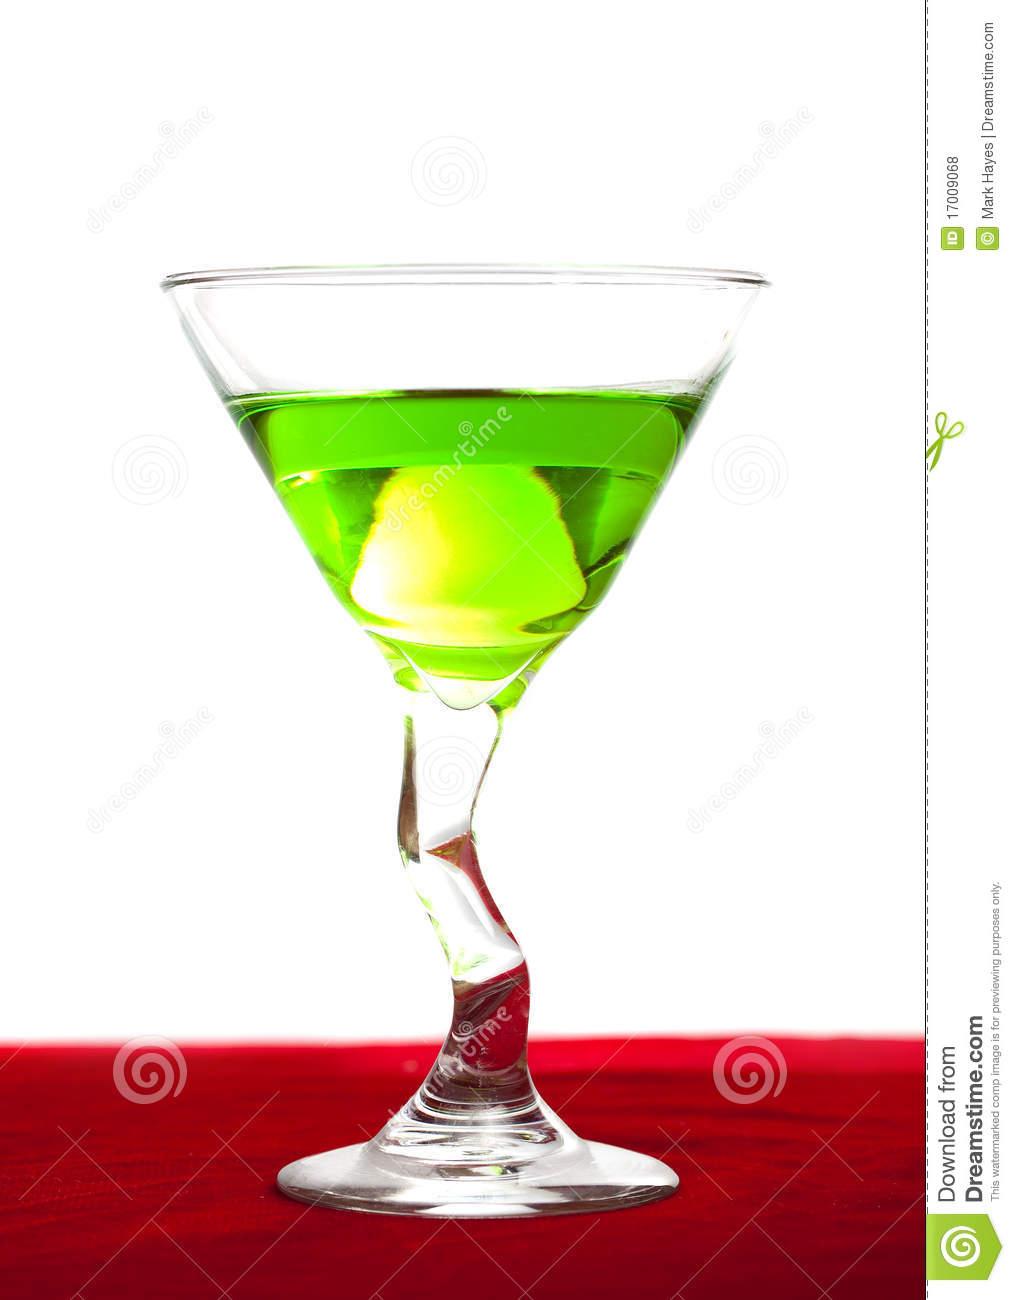 Apple Martini Royalty Free Stock Photos   Image  17009068